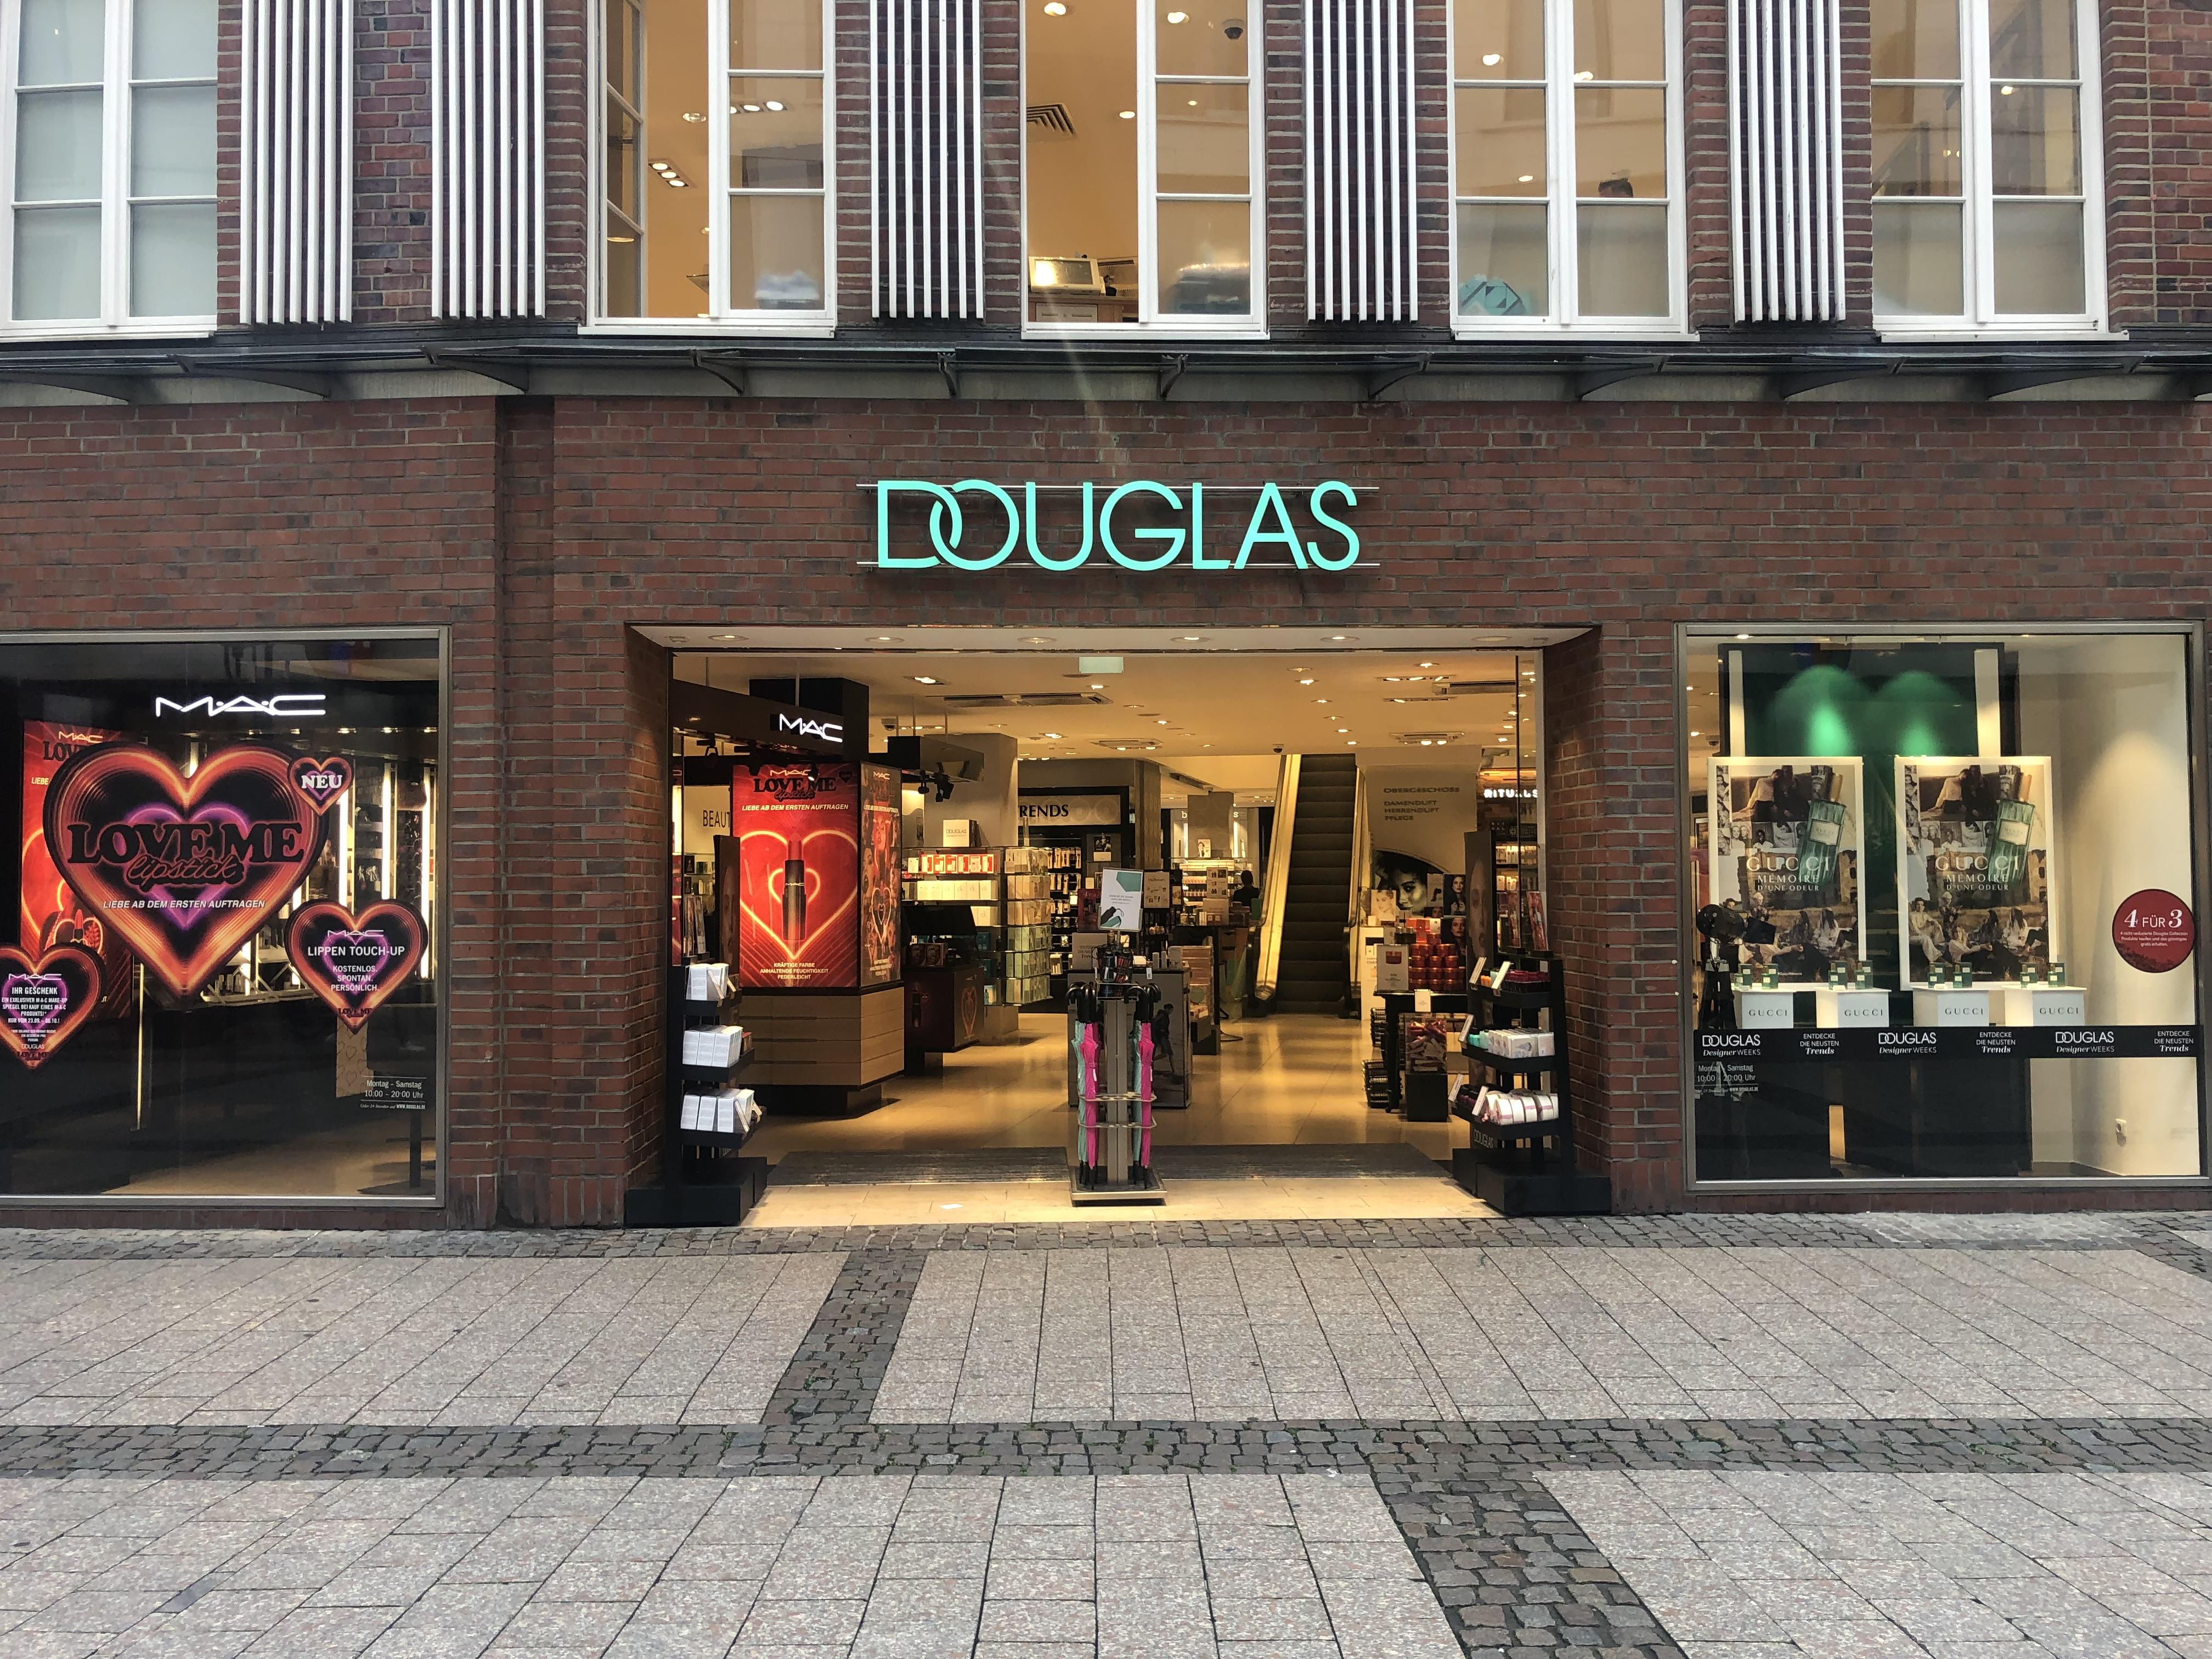 Parfümerie Douglas Münster